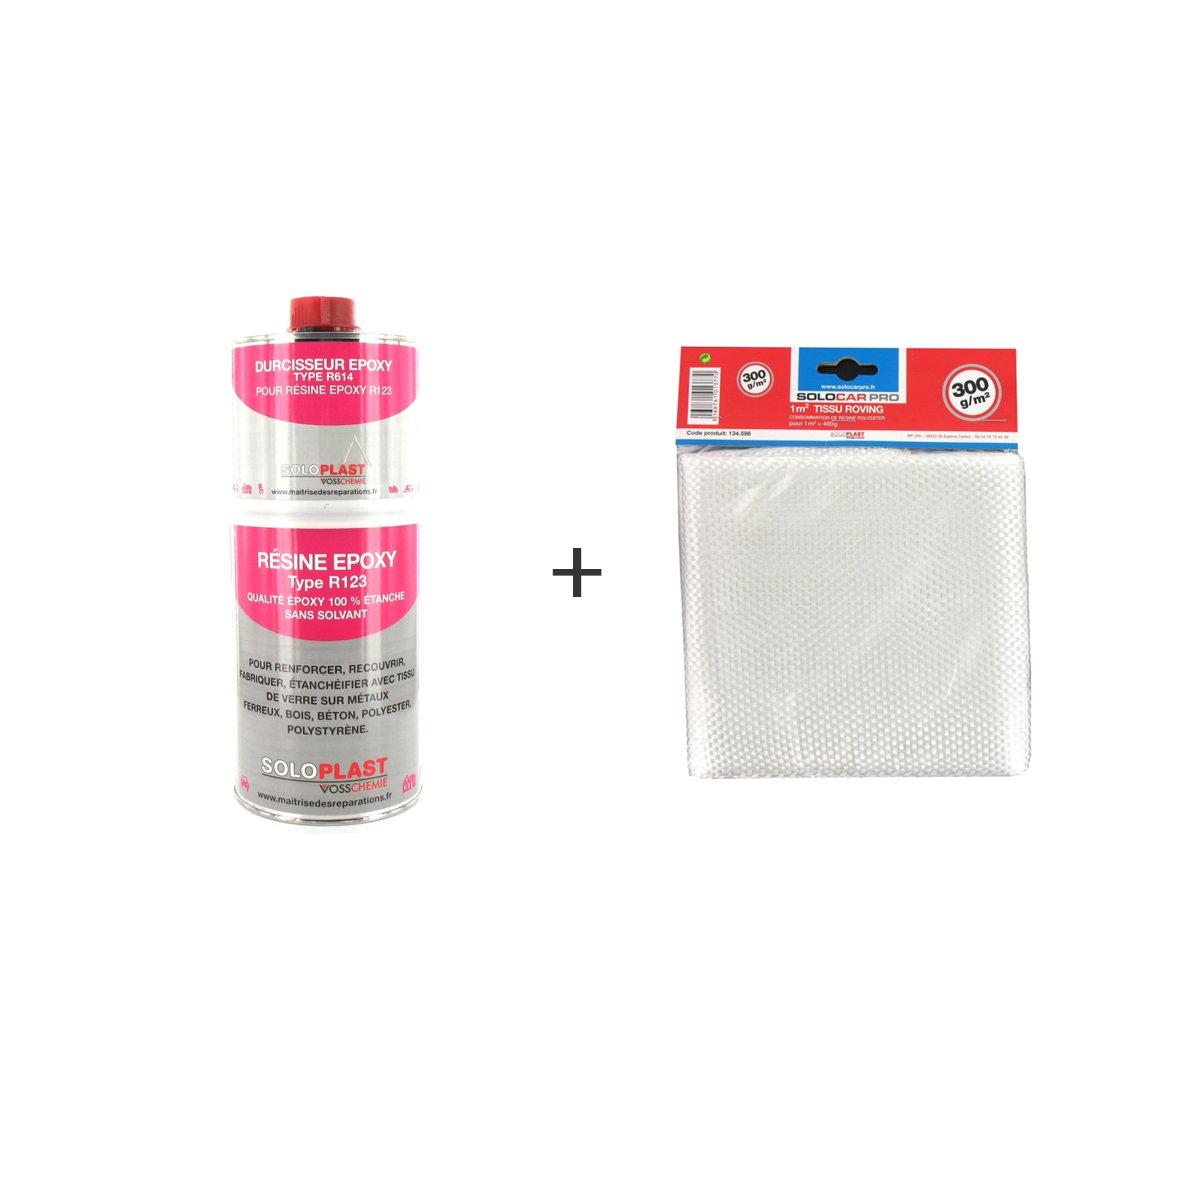 Pack ré sine epoxy type R123 Soloplast 1 Kg - Tissu de verre Soloplast Roving 300g m2